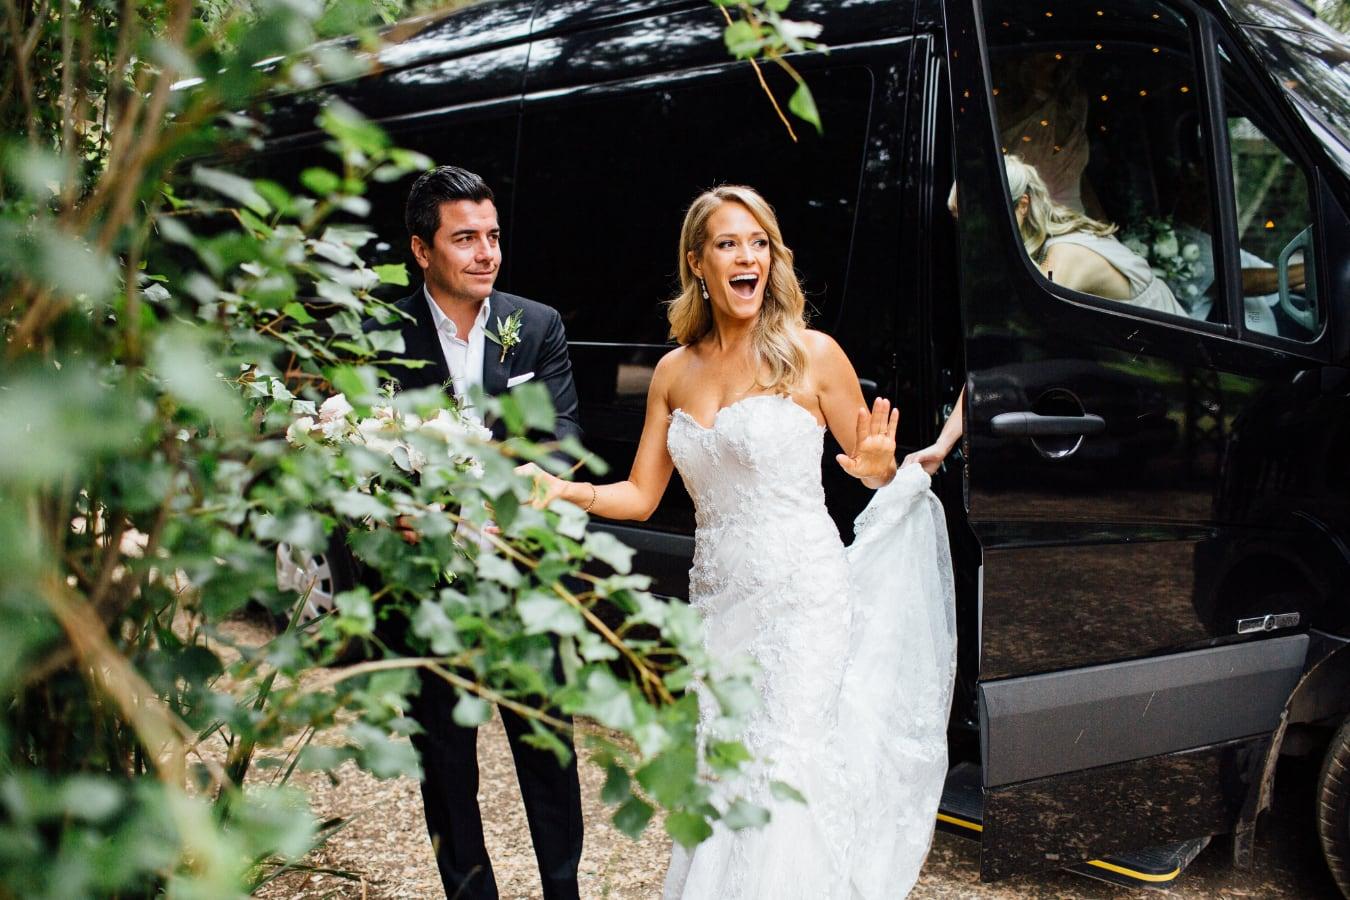 Bride and Groom exiting Swoop Van